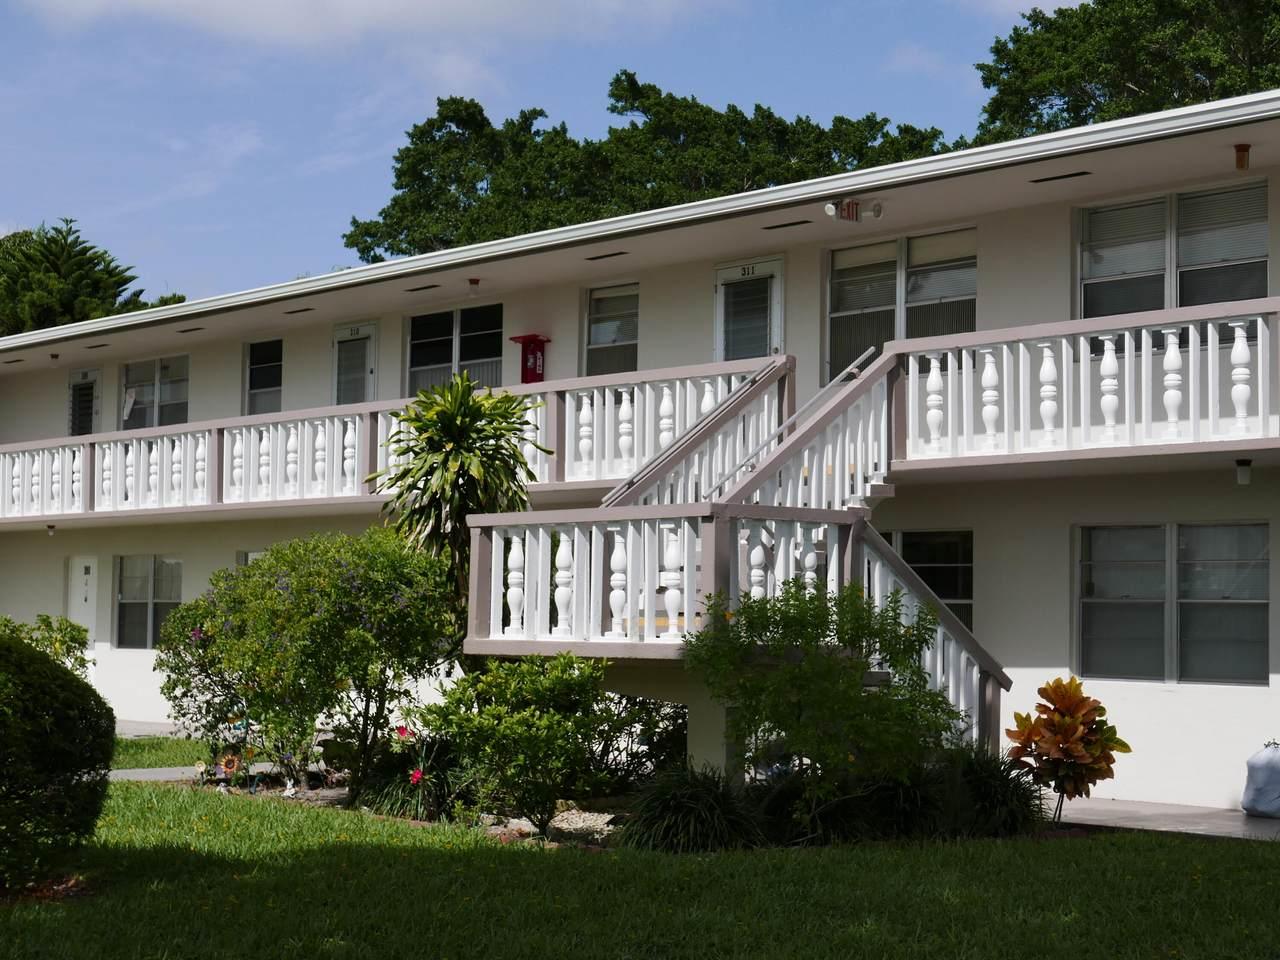 311 Chatham O - Photo 1